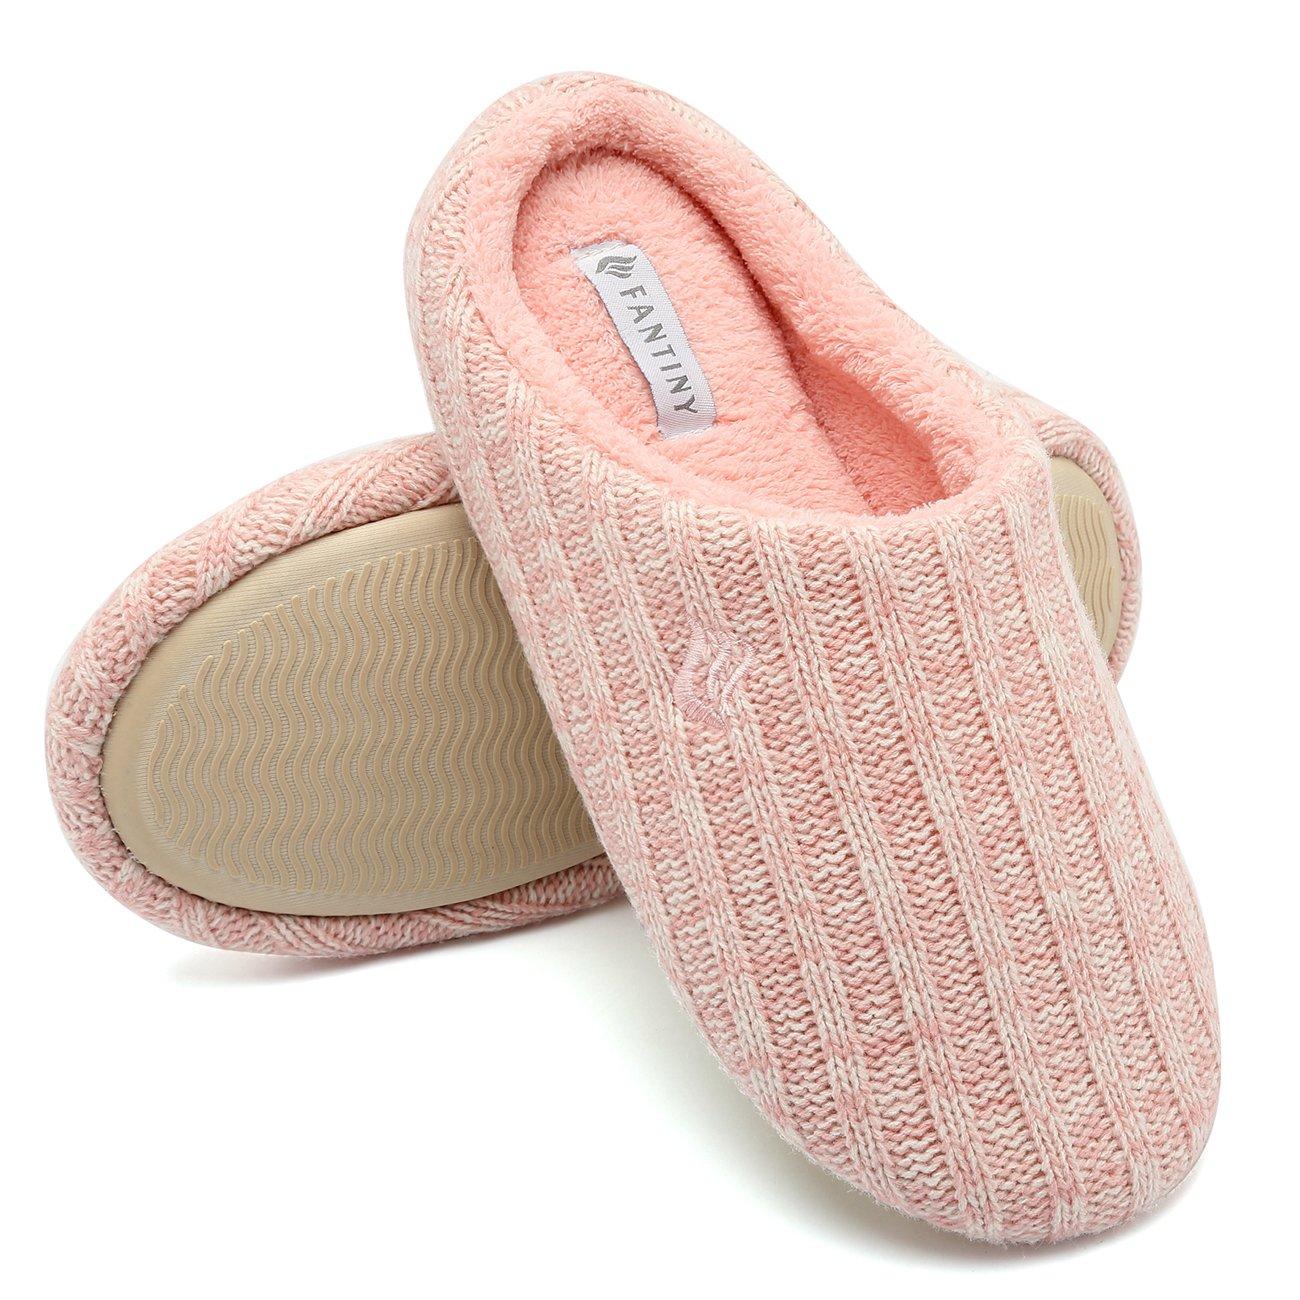 Fanture Women's House Slippers Indoor Memory Foam Cashmere Cotton Knitted Autumn Winter Anti-slip-U4MTW005-Pink-40-41